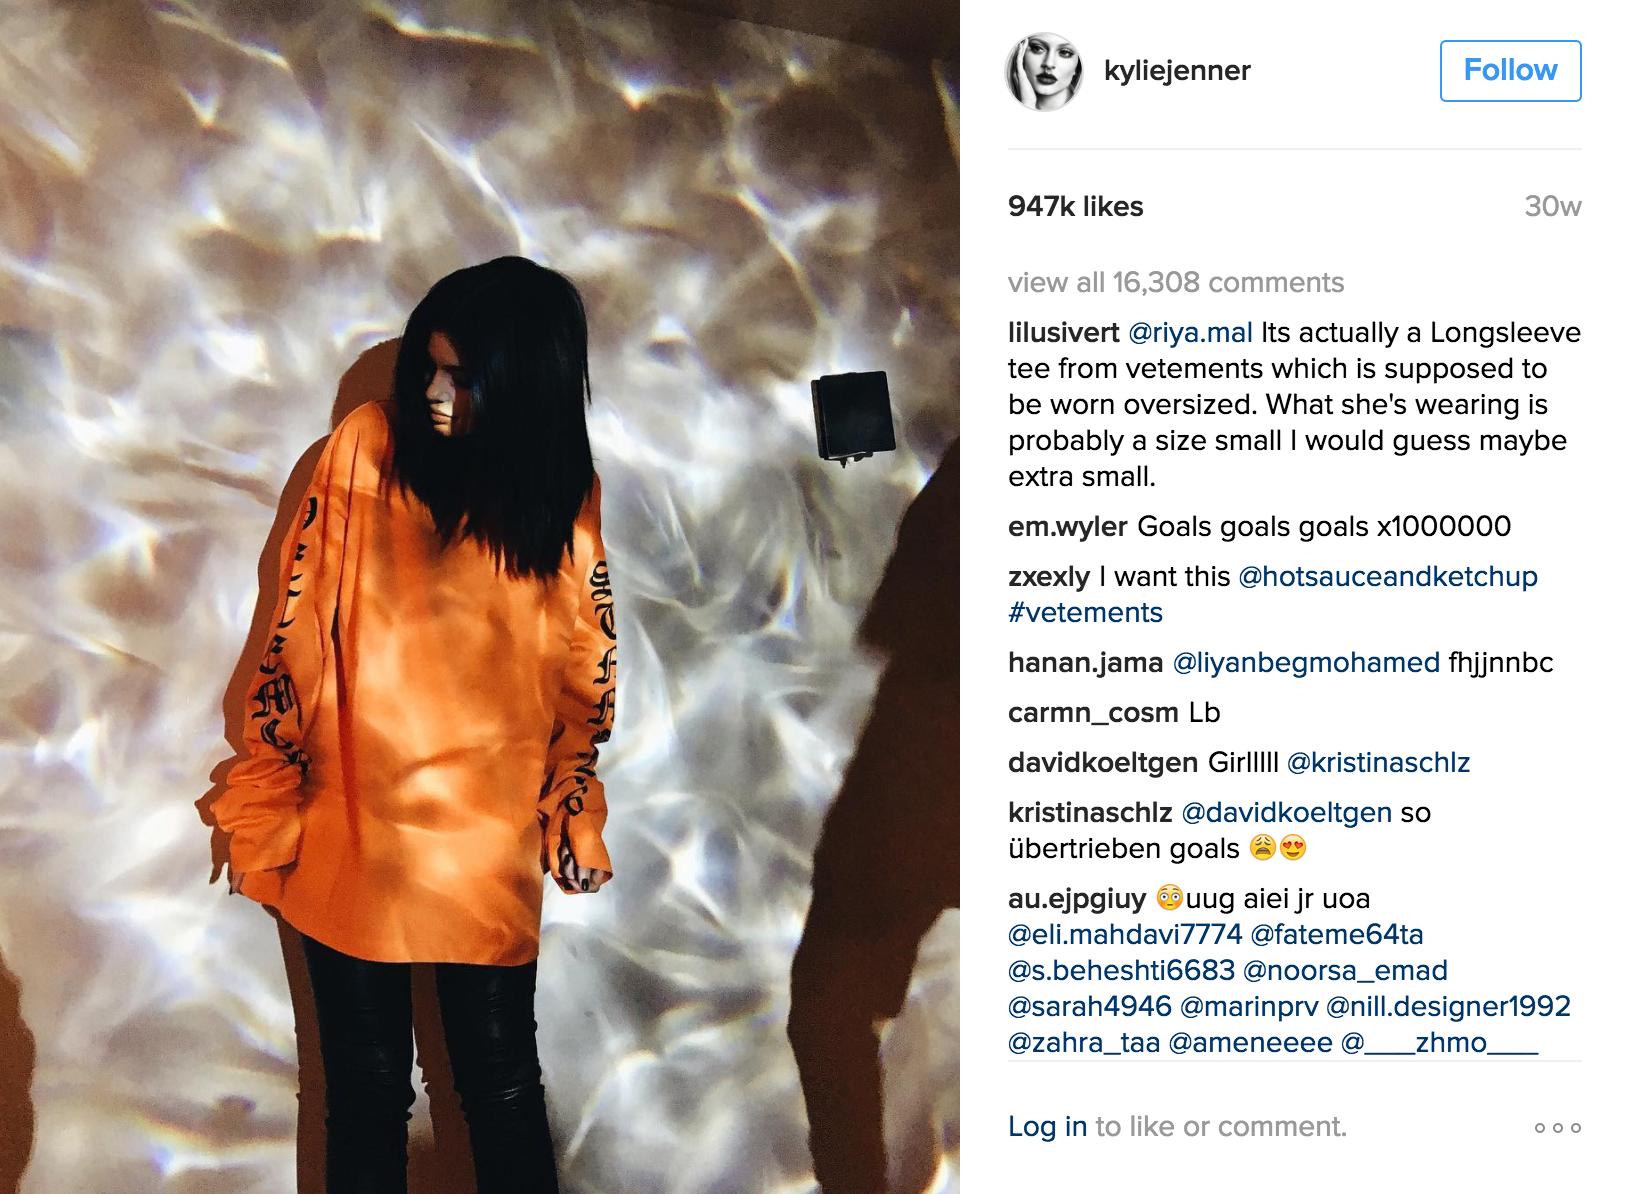 Kylie Jenner Instagram